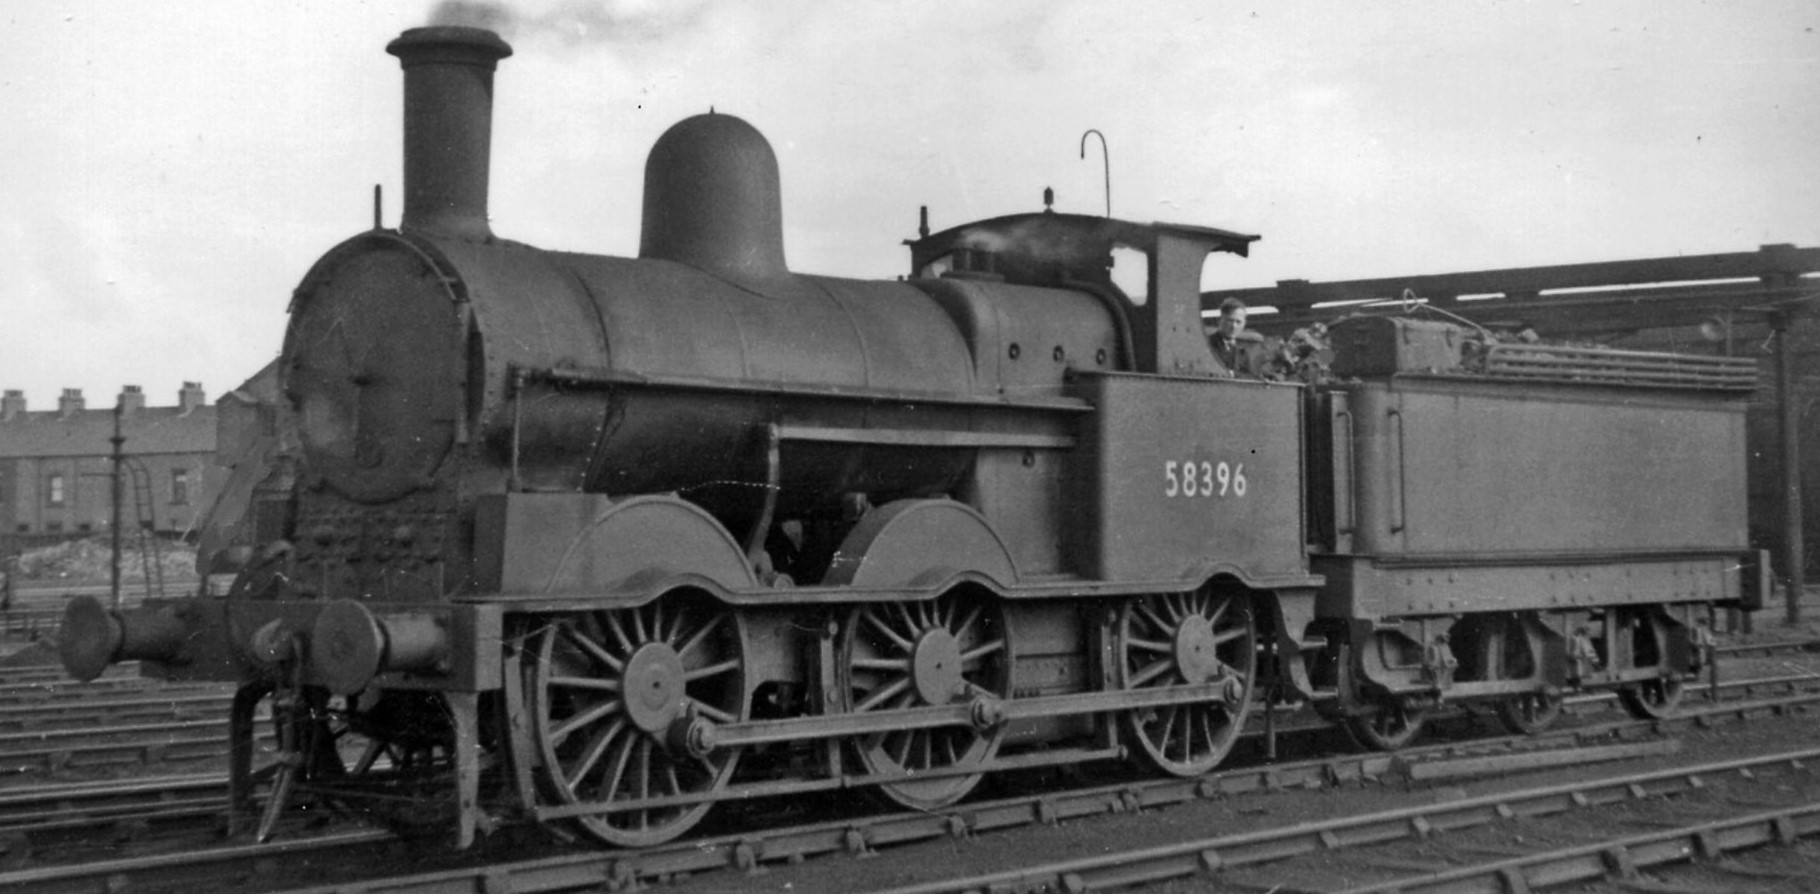 58396 at Workington Locomotive Depot in August 1951. ©Ben Brooksbank